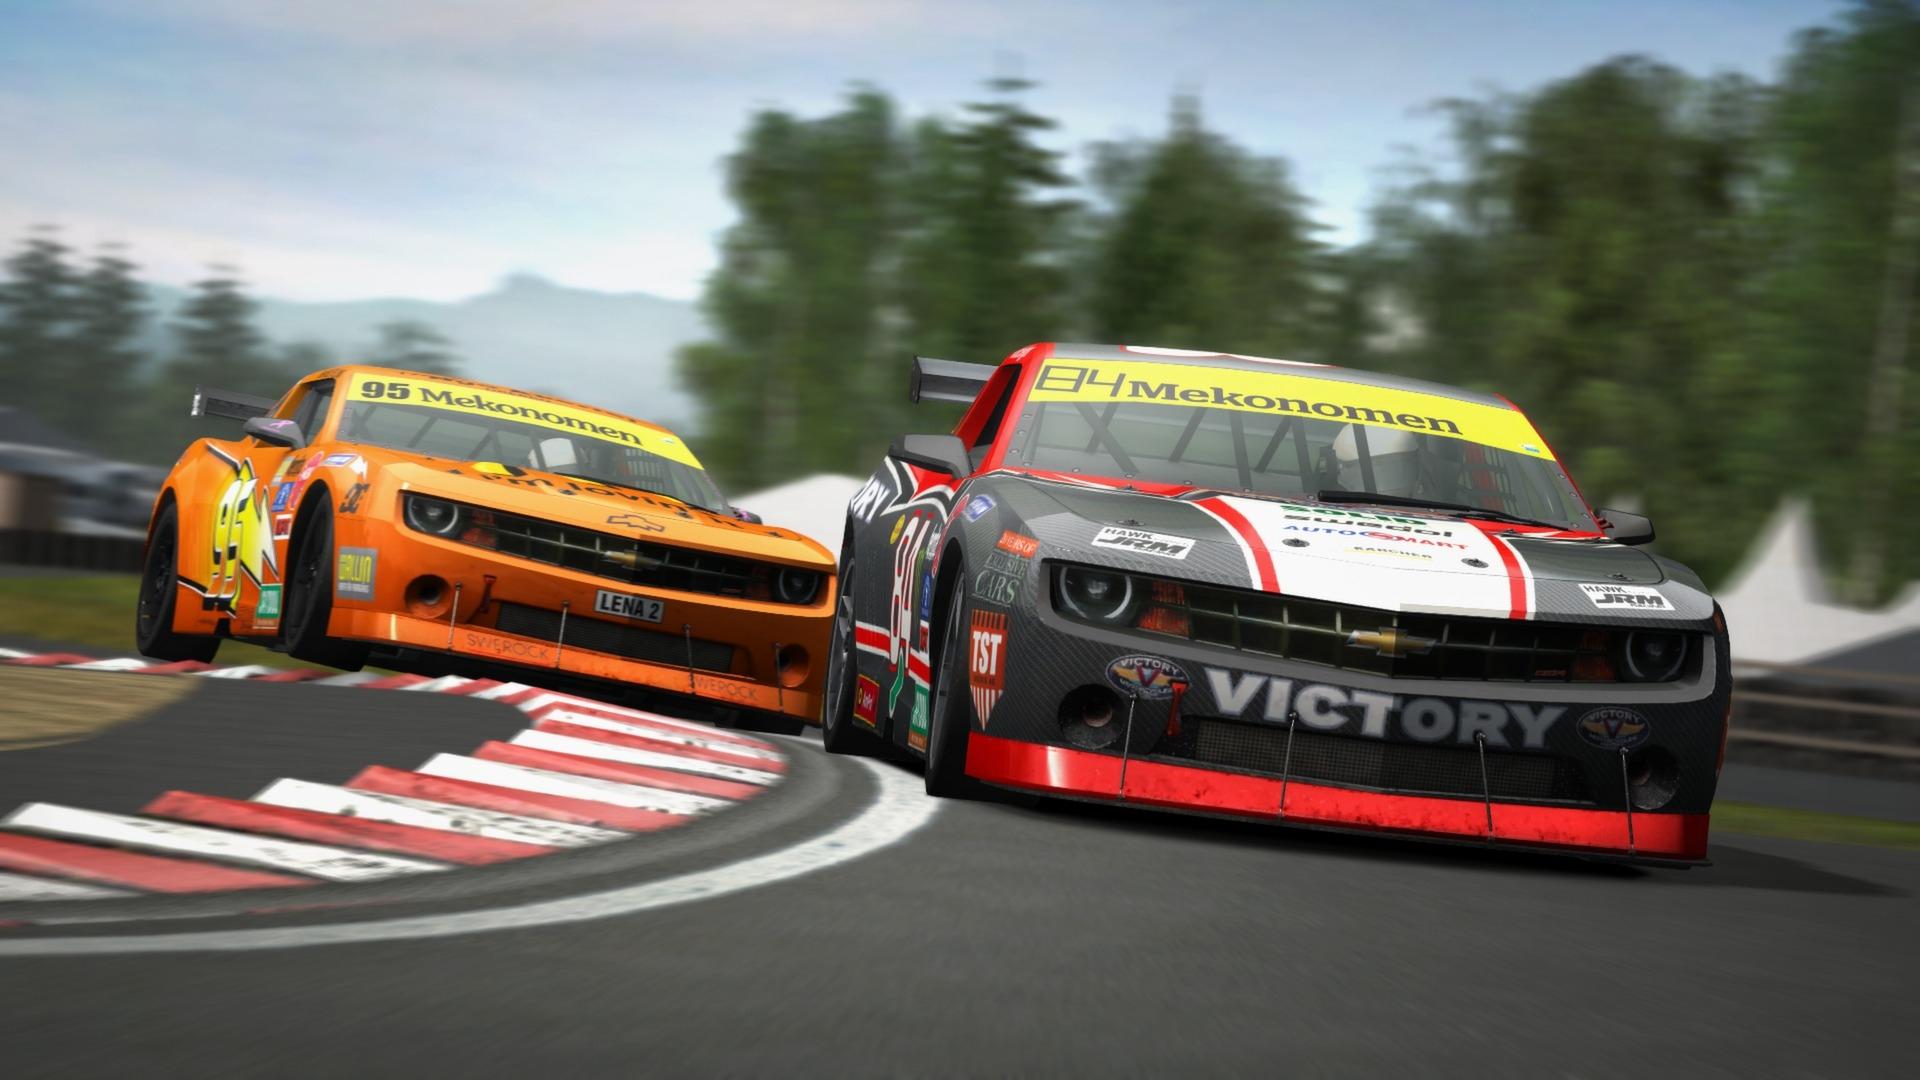 Best Racing Games Ten Of The Best For Pc